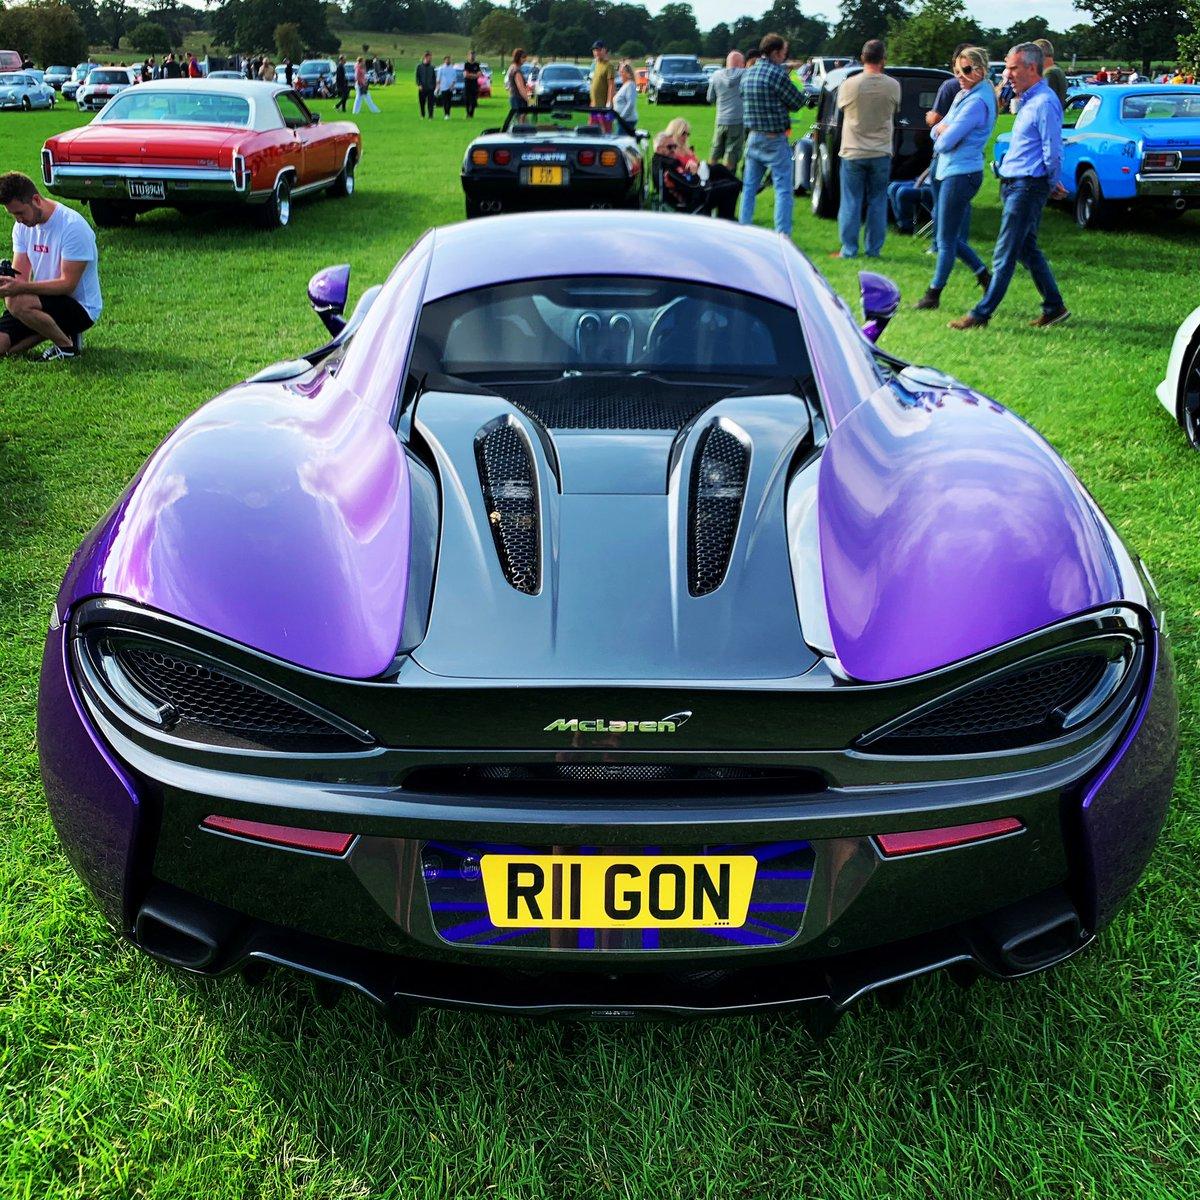 What a car, what a colour!  Hello @mclaren @mclarenauto @mclarenbirmingham   #supercarsfordad #supercar #supercars #mclaren #mclaren720s #720s #mclaren765lt #765lt #mclaren570s #570s #mclarenmp412c #mp412c #mclaren650s #650s #mclarensenna #senna #mclarenp1 #p1 #mclarenf1 #f1 #mso https://t.co/HdKxxvIfti